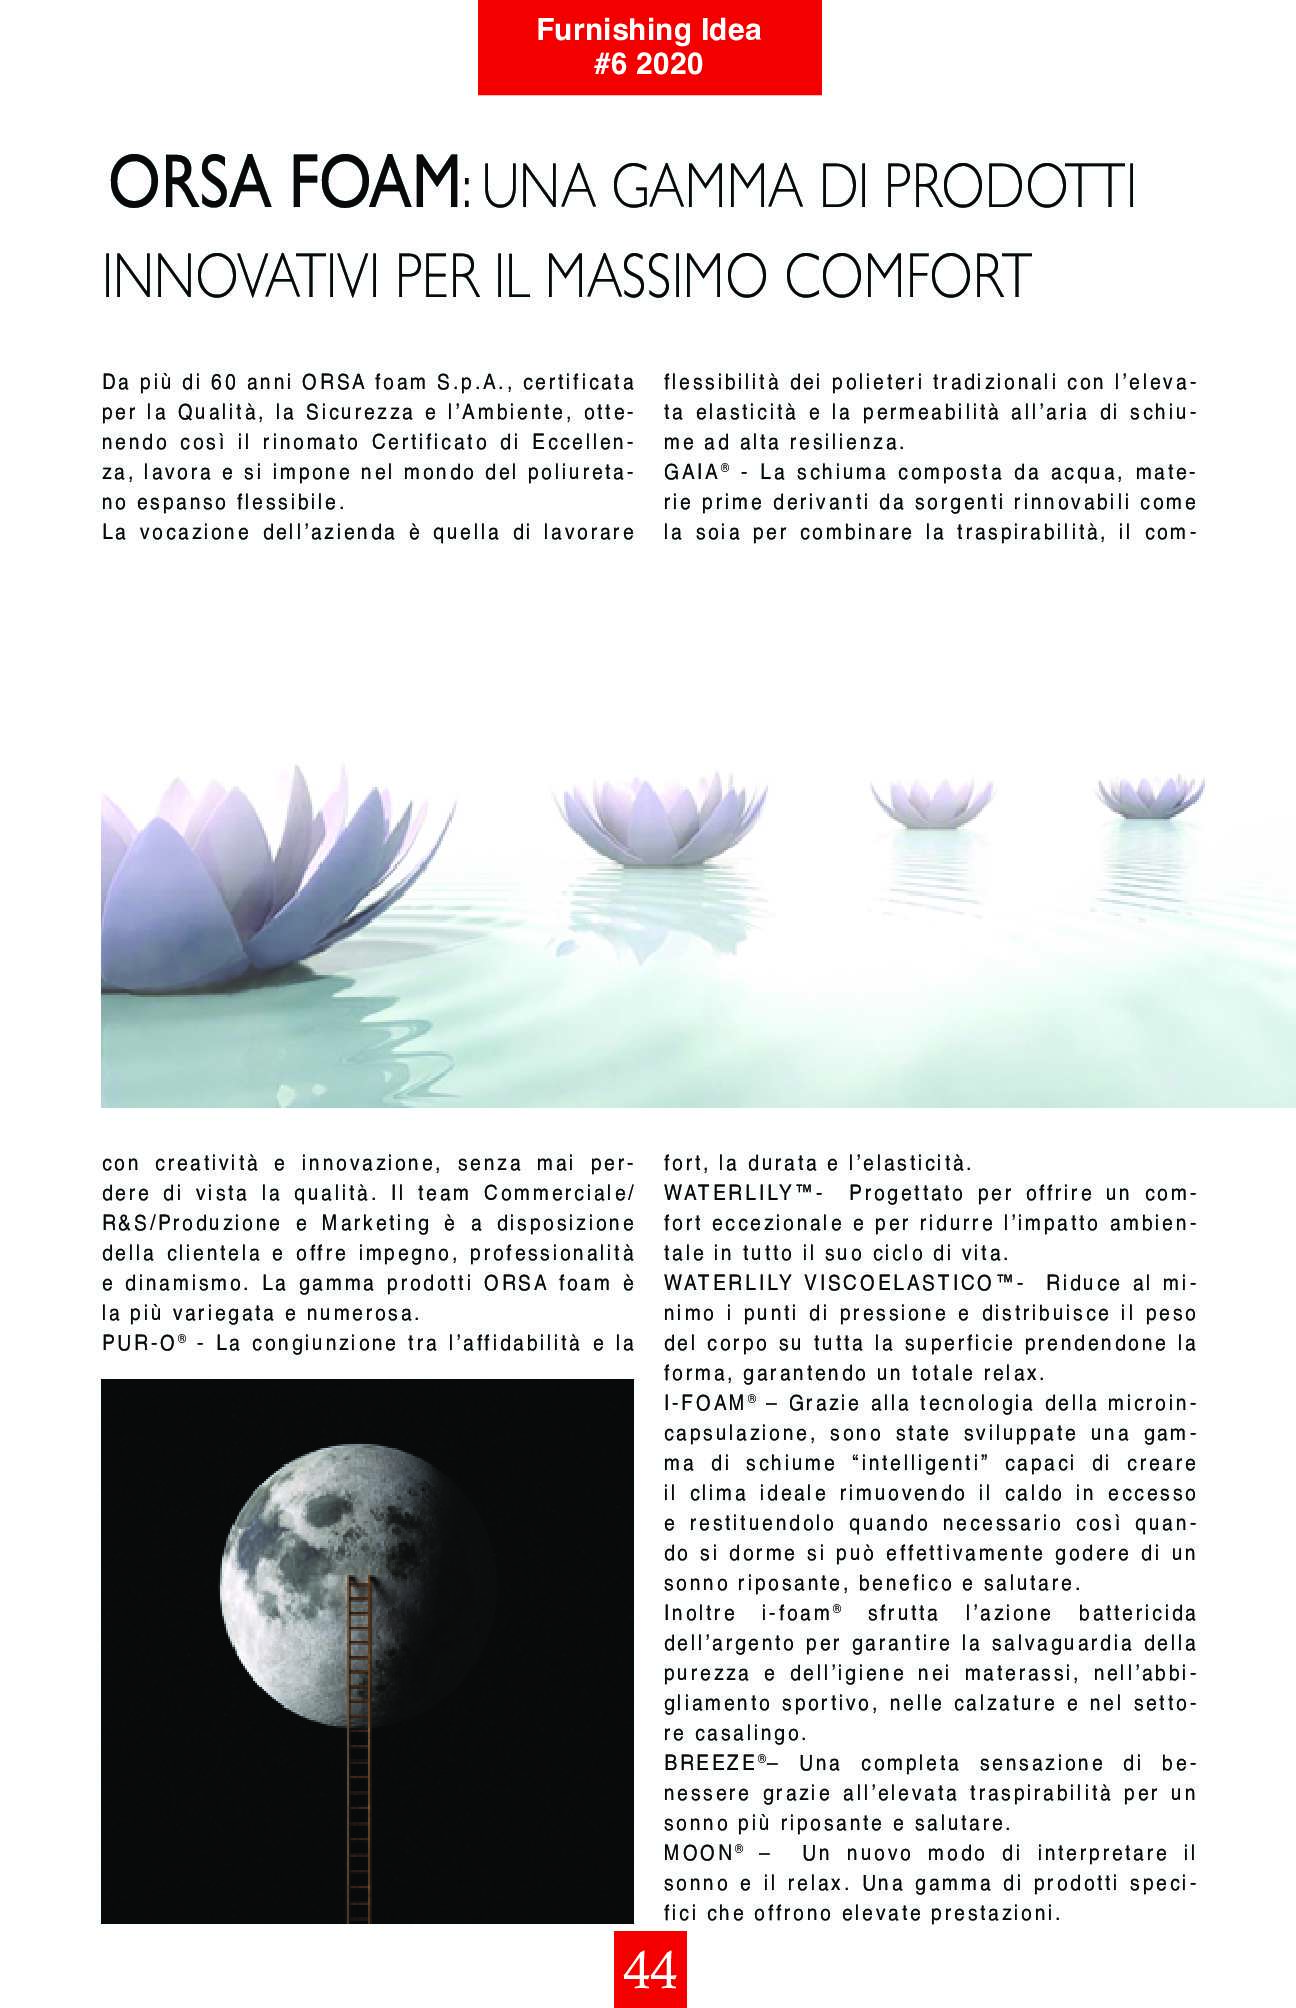 furnishingidea-6-2020_journal_22_043.jpg